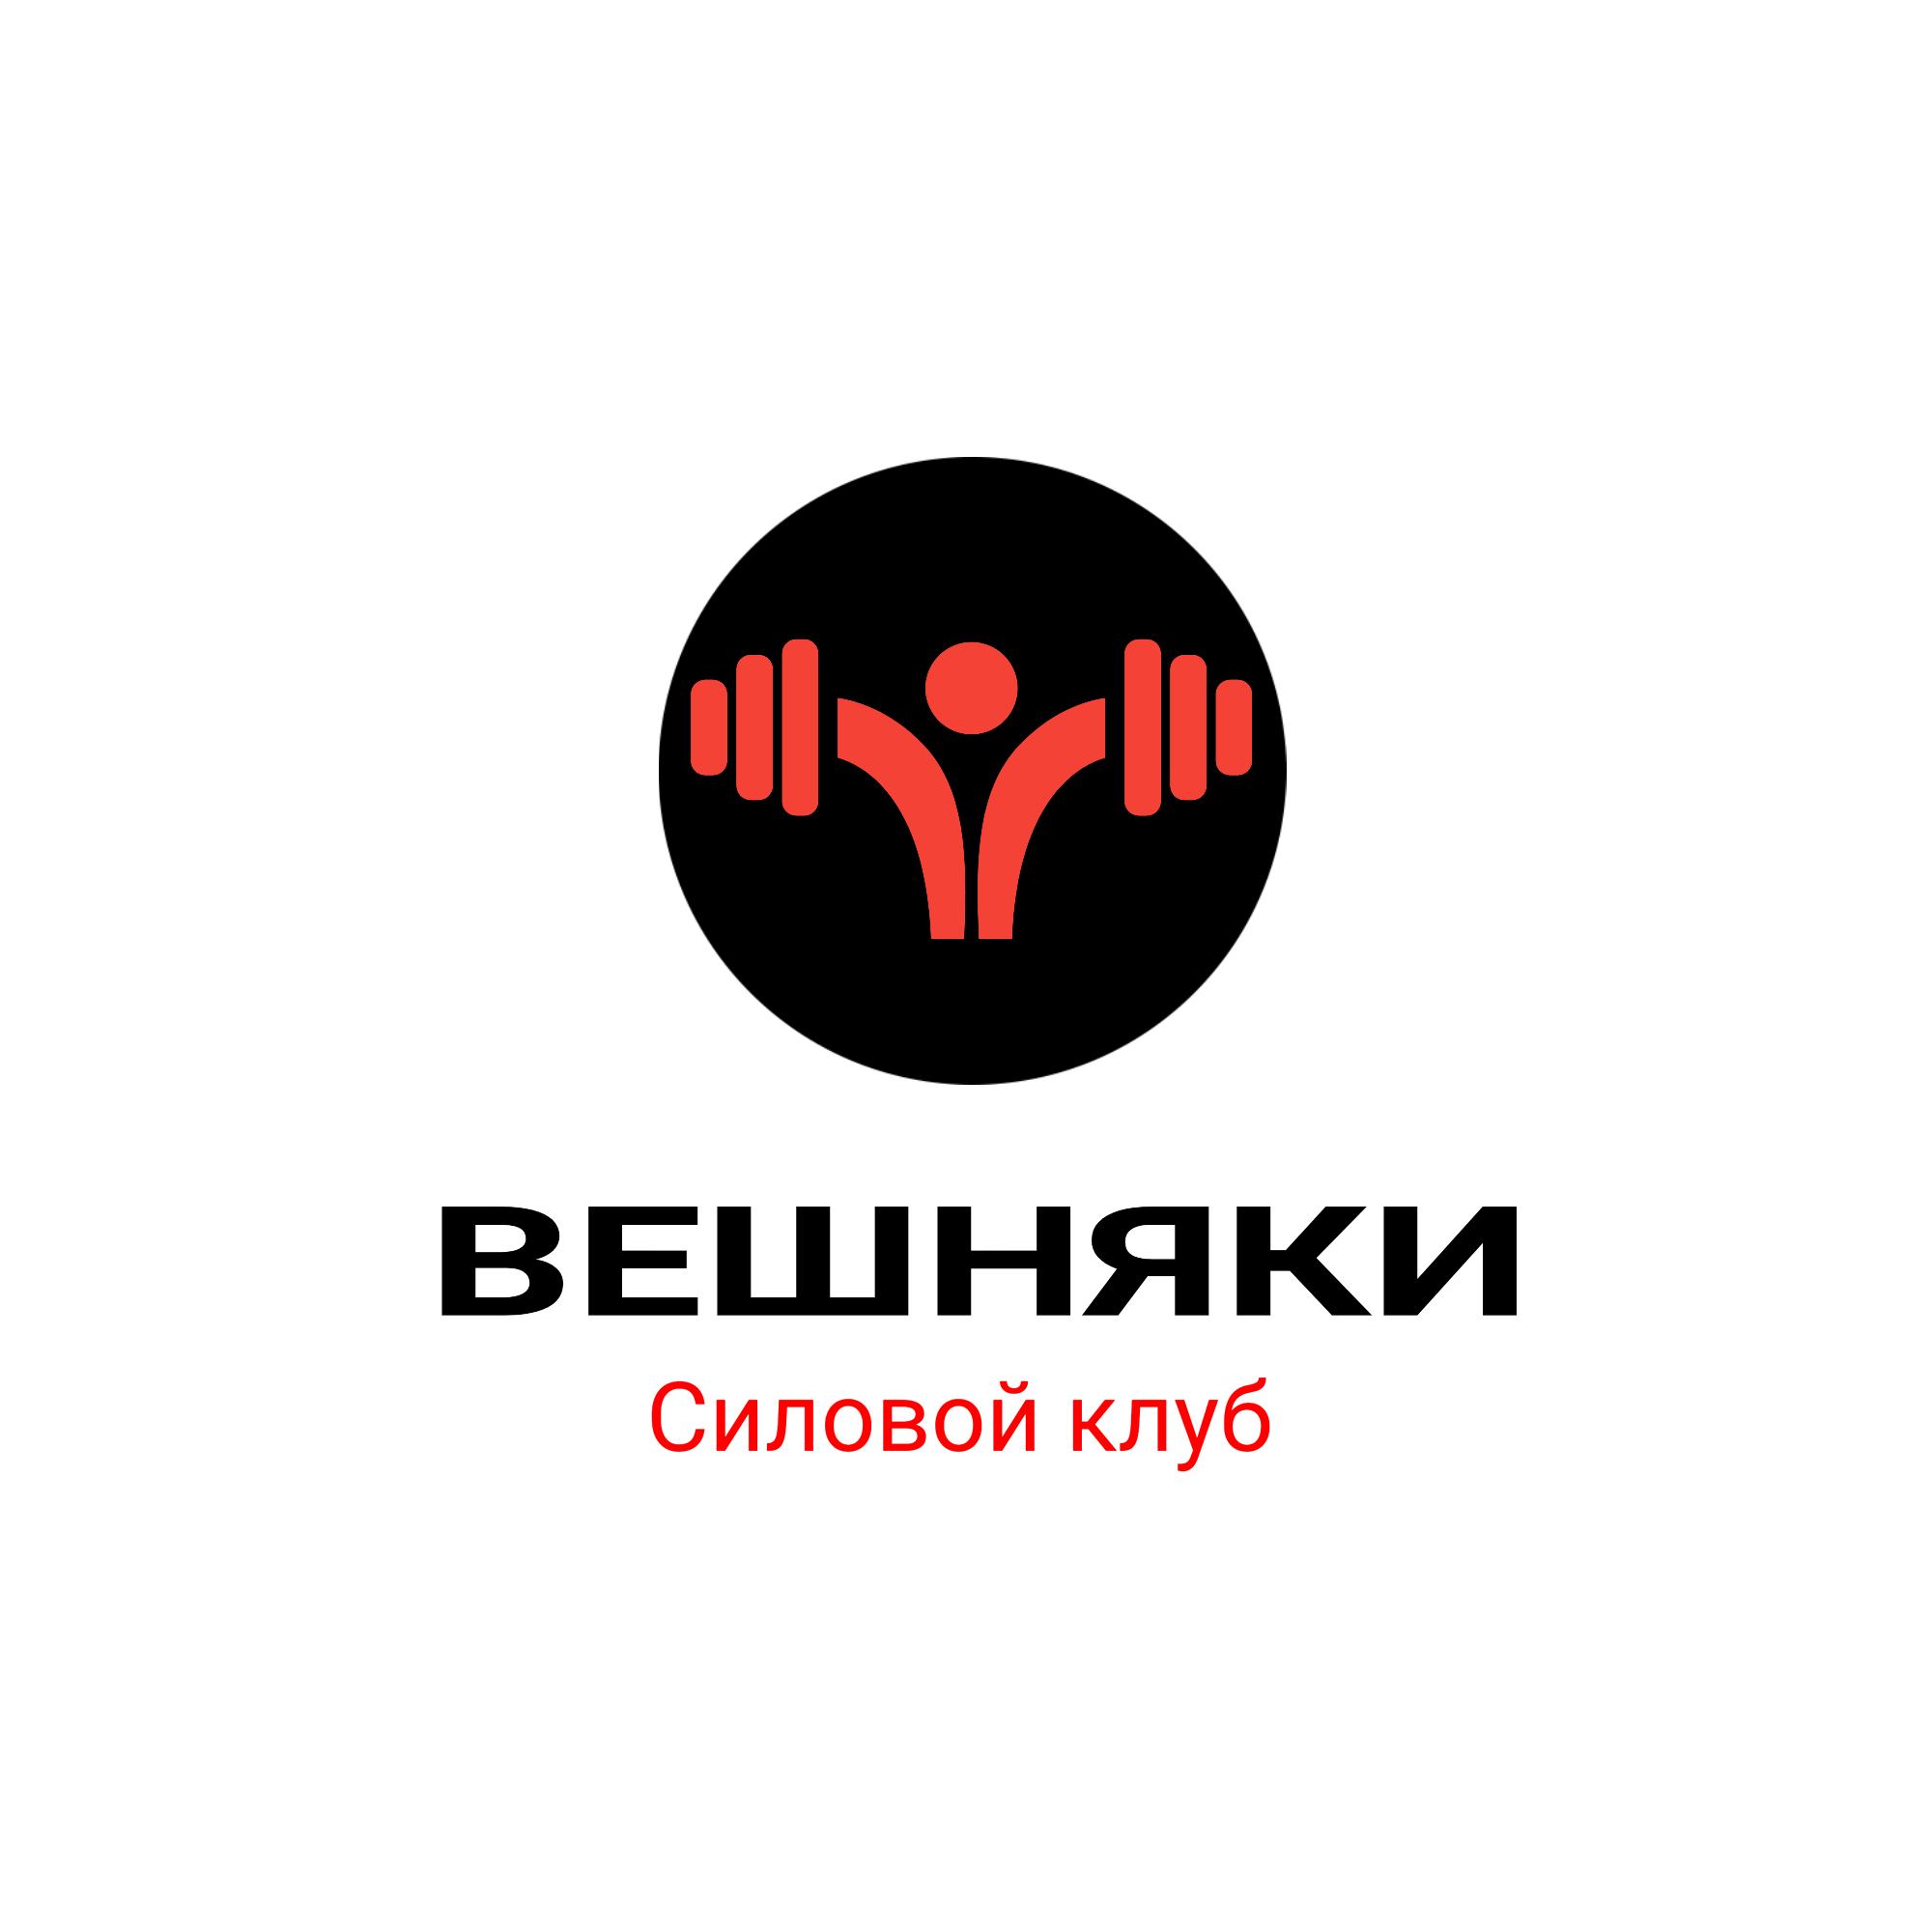 Адаптация (разработка) логотипа Силового клуба ВЕШНЯКИ в инт фото f_7355fb92bada4392.jpg